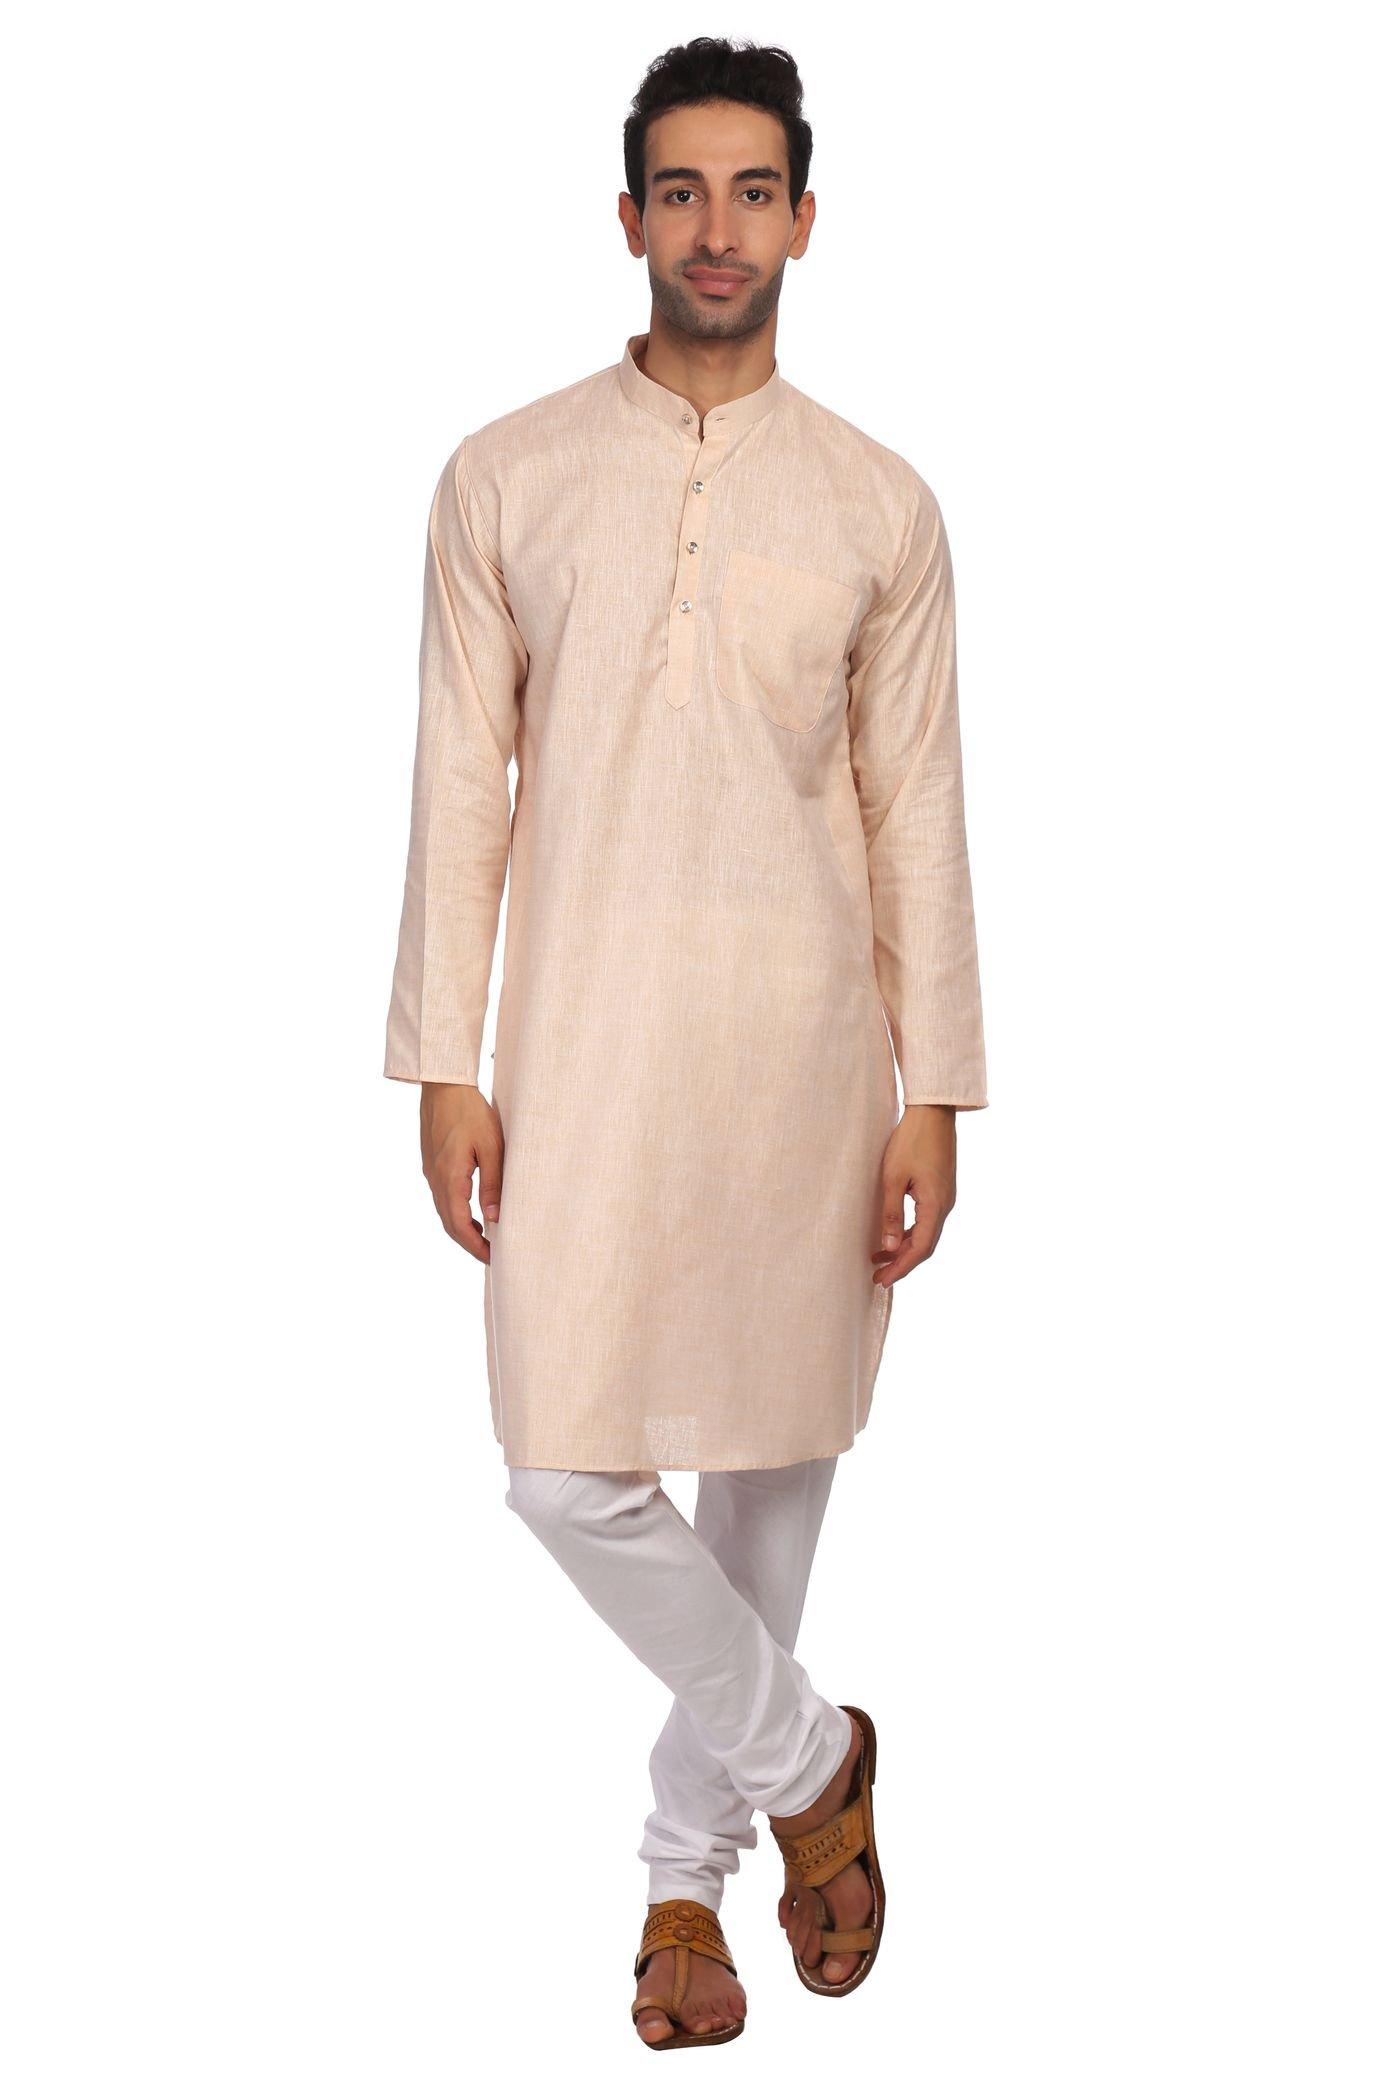 WINTAGE Men's Cotton Rich Tailored Fit Party/Festive Indian Kurta Pajama Pyjama Sleep Sets : Orange, Large